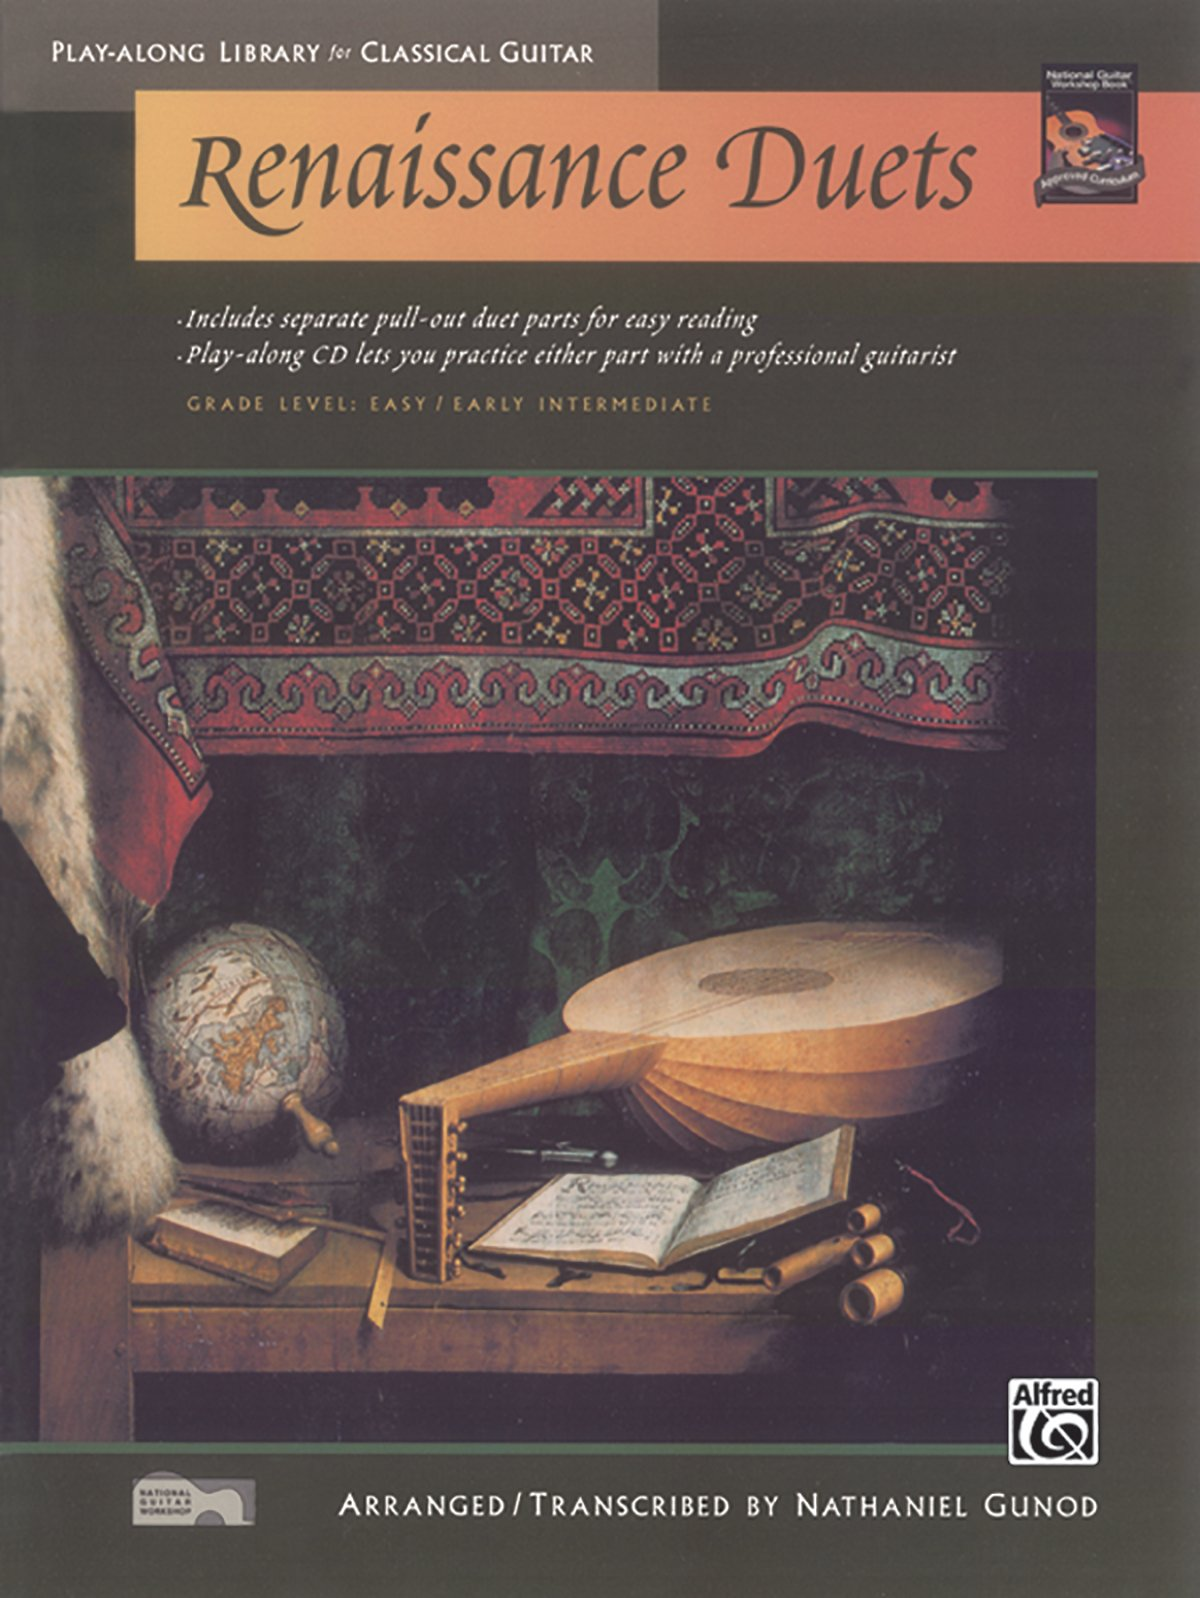 Renaissance Duets (Play-Along Library for Classical Guitar), Gunod, Nathaniel